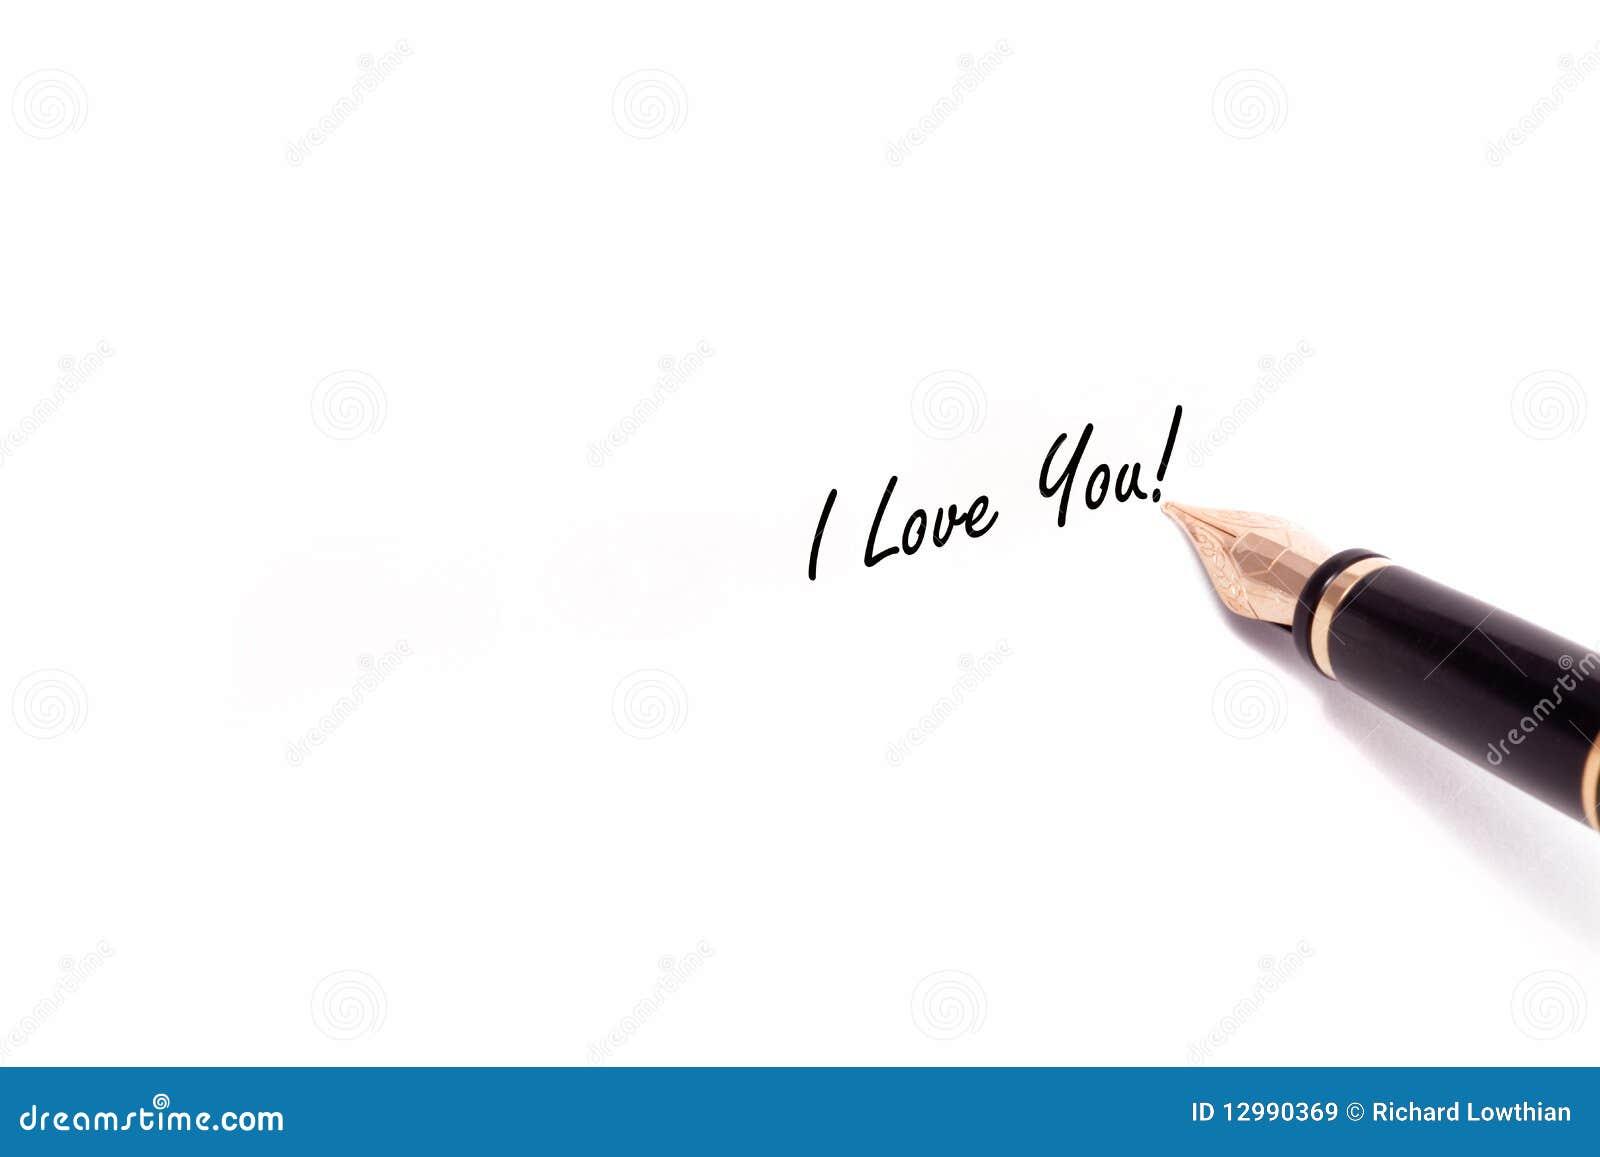 Eu Te Amo Escrito Na Areia Imagens De Stock Royalty Free: Escrita Da Pena De Fonte Imagens De Stock Royalty Free